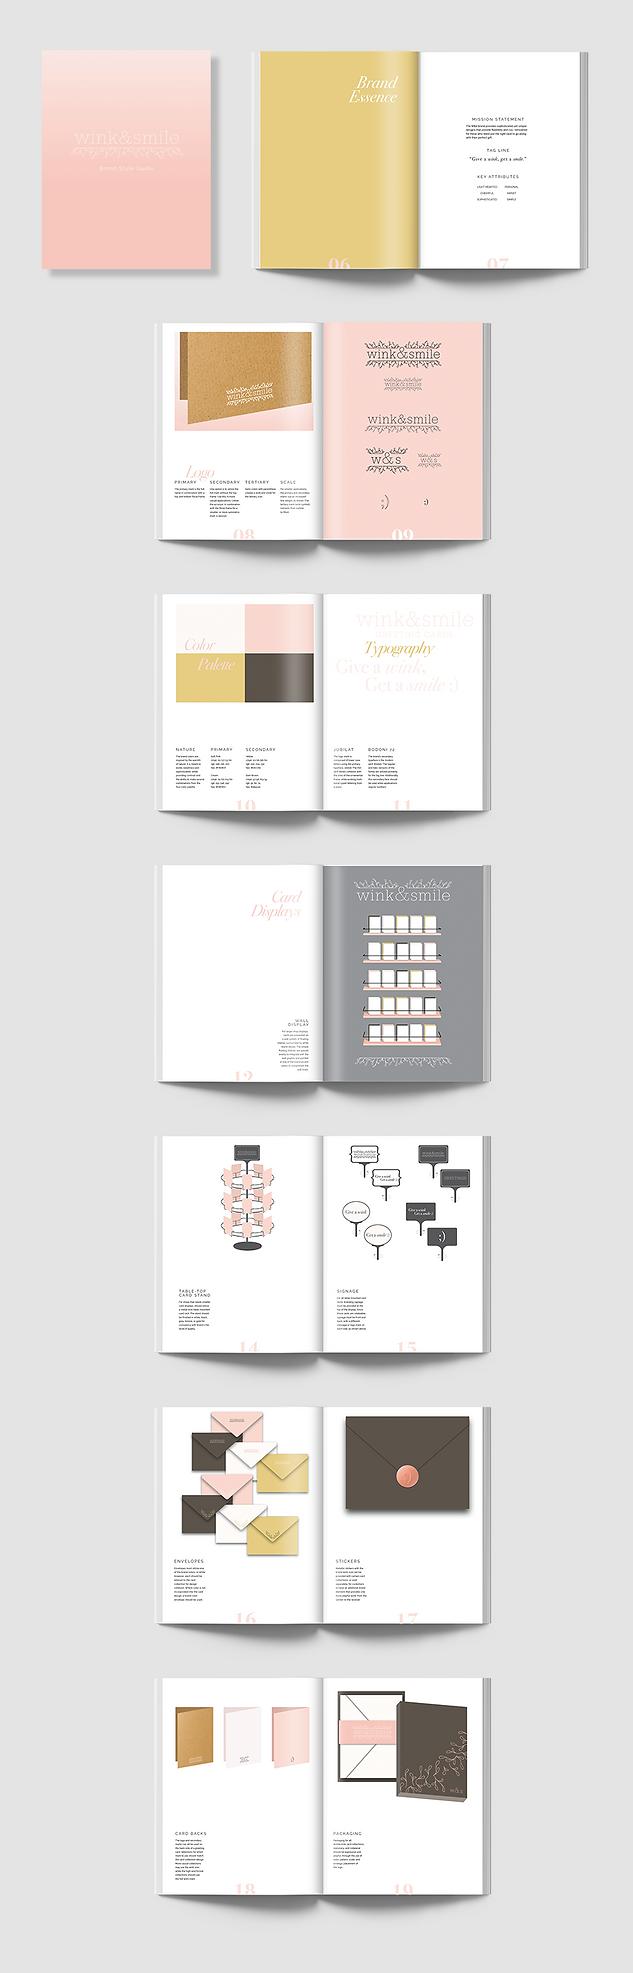 3 - MockUp_BrandBook.png